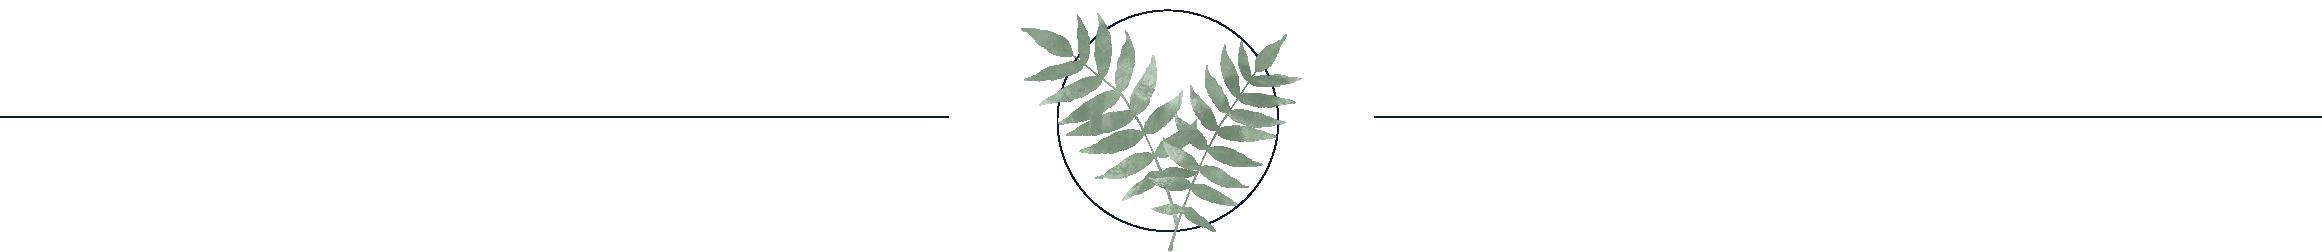 BC-leaves-divider